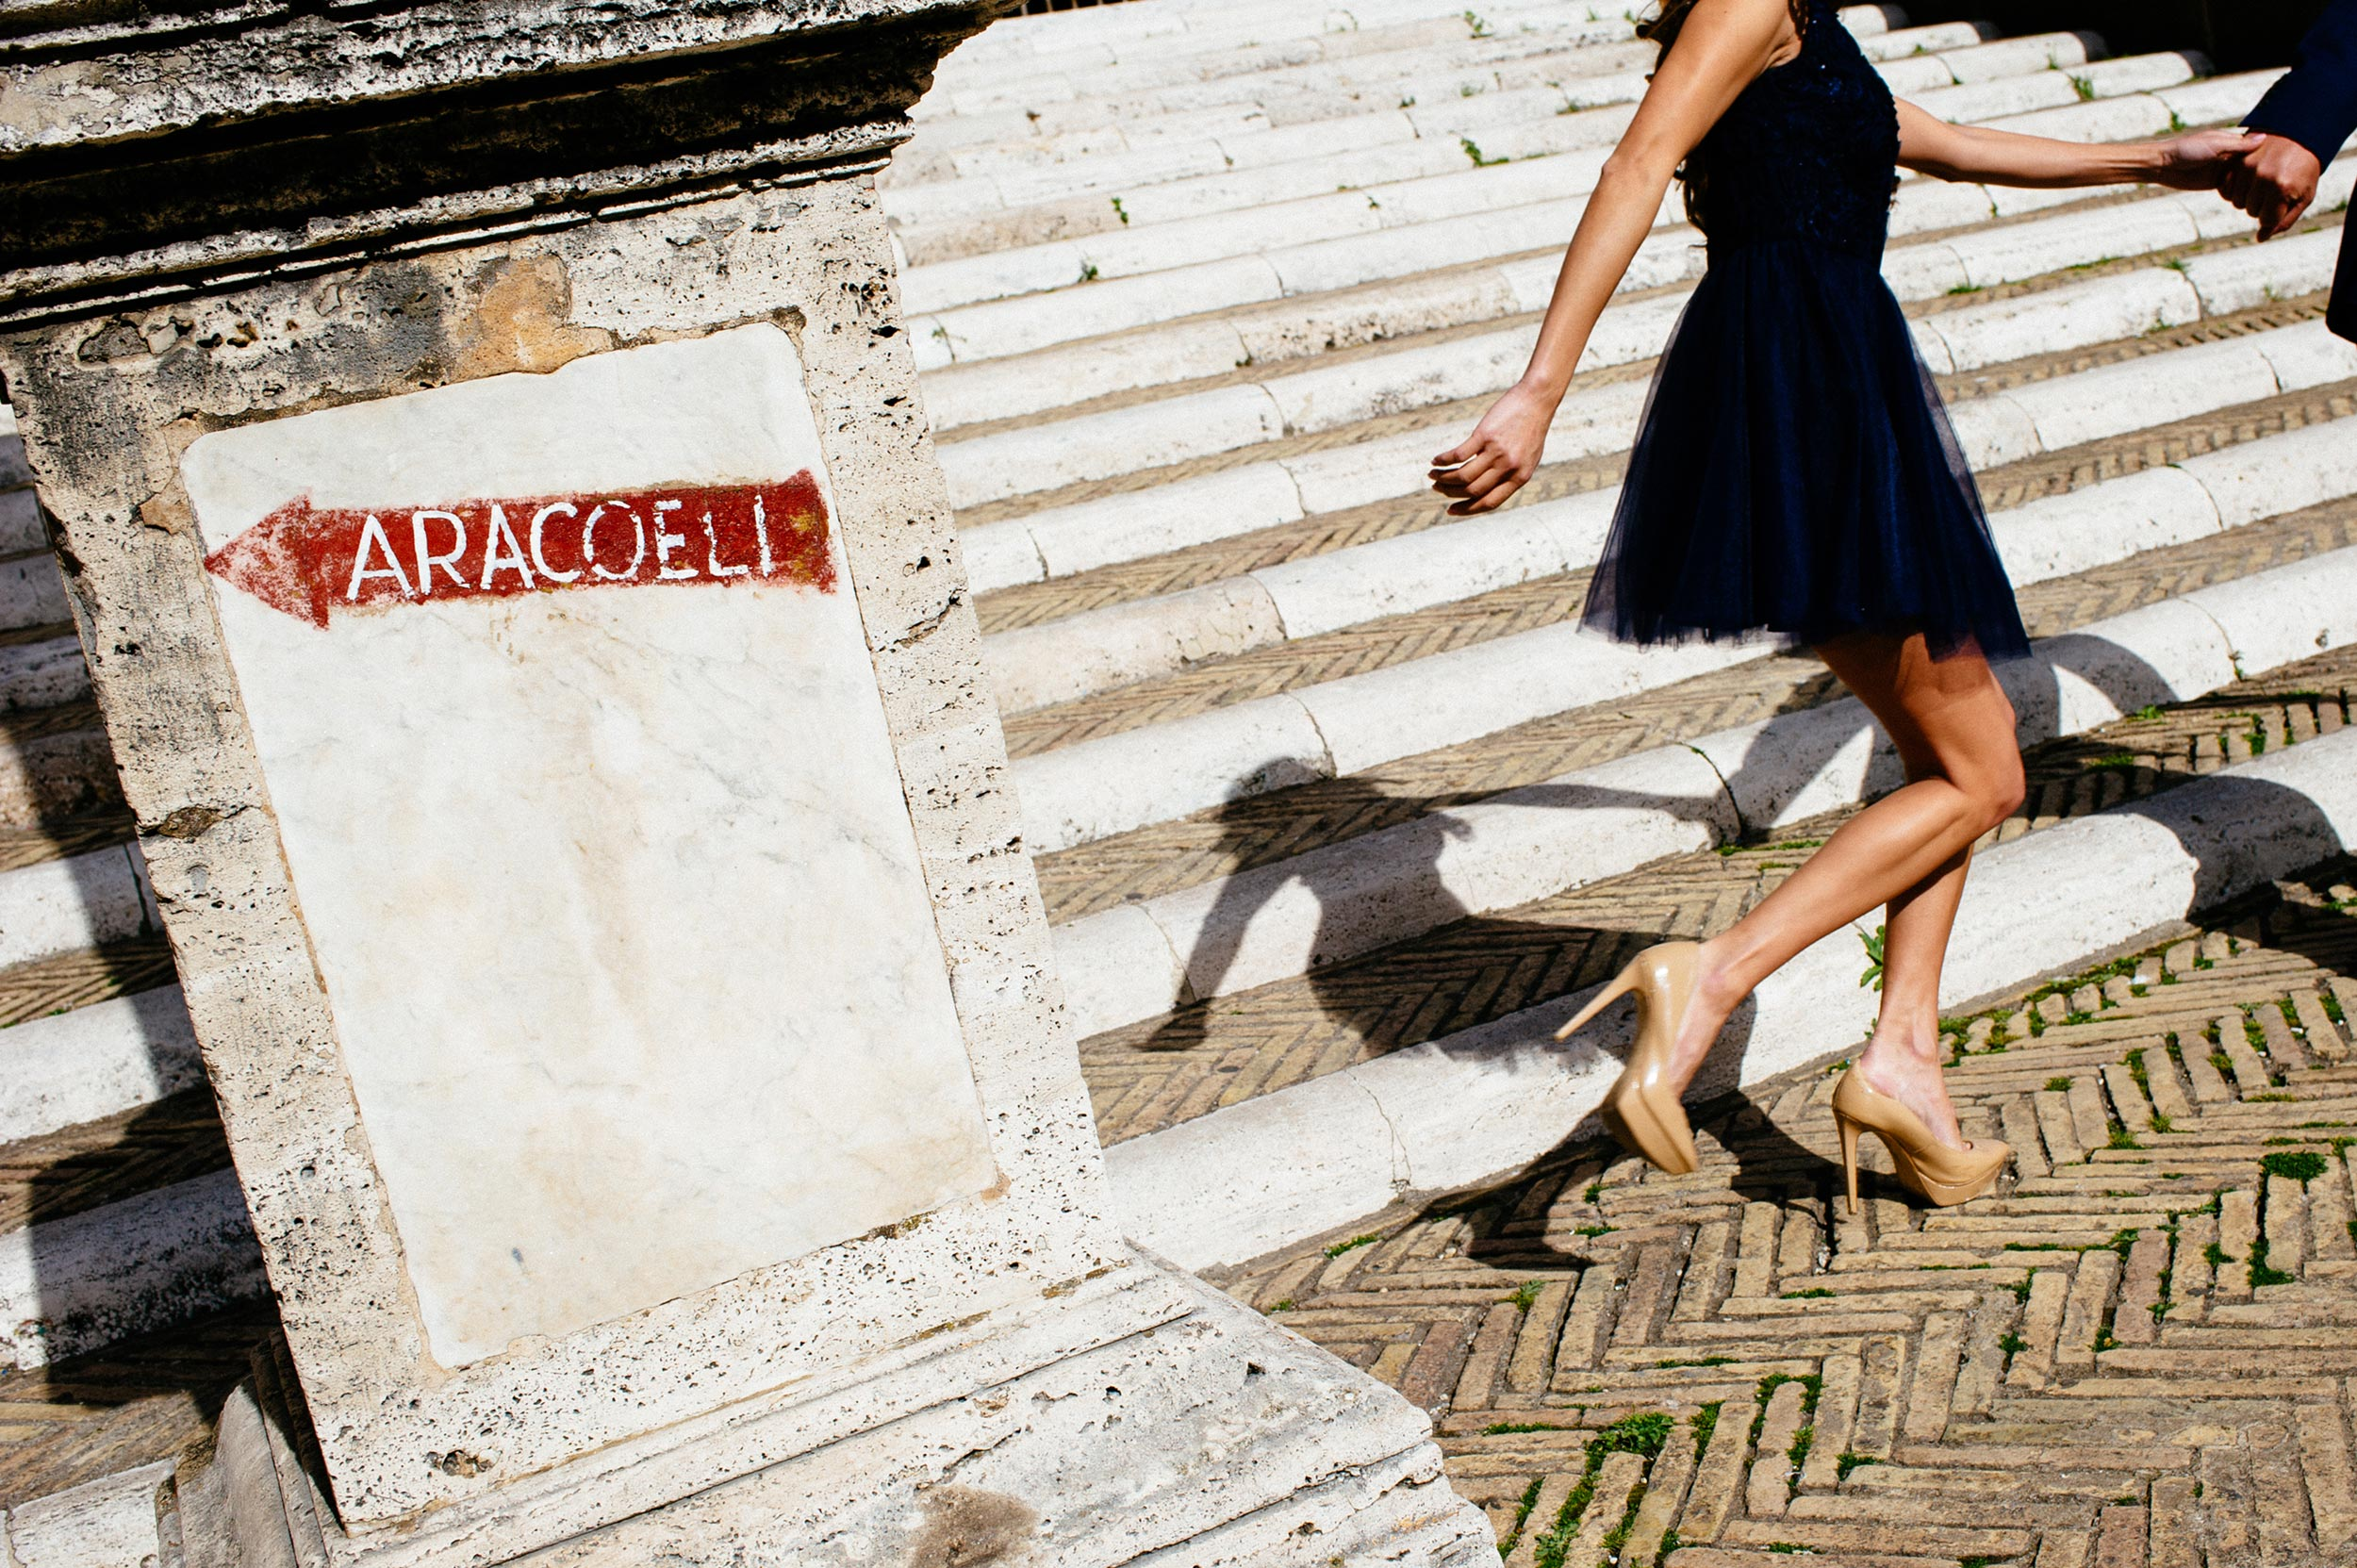 engagement-in-rome-ara-coeli-couple-running-steps-alessandro-avenali.jpg